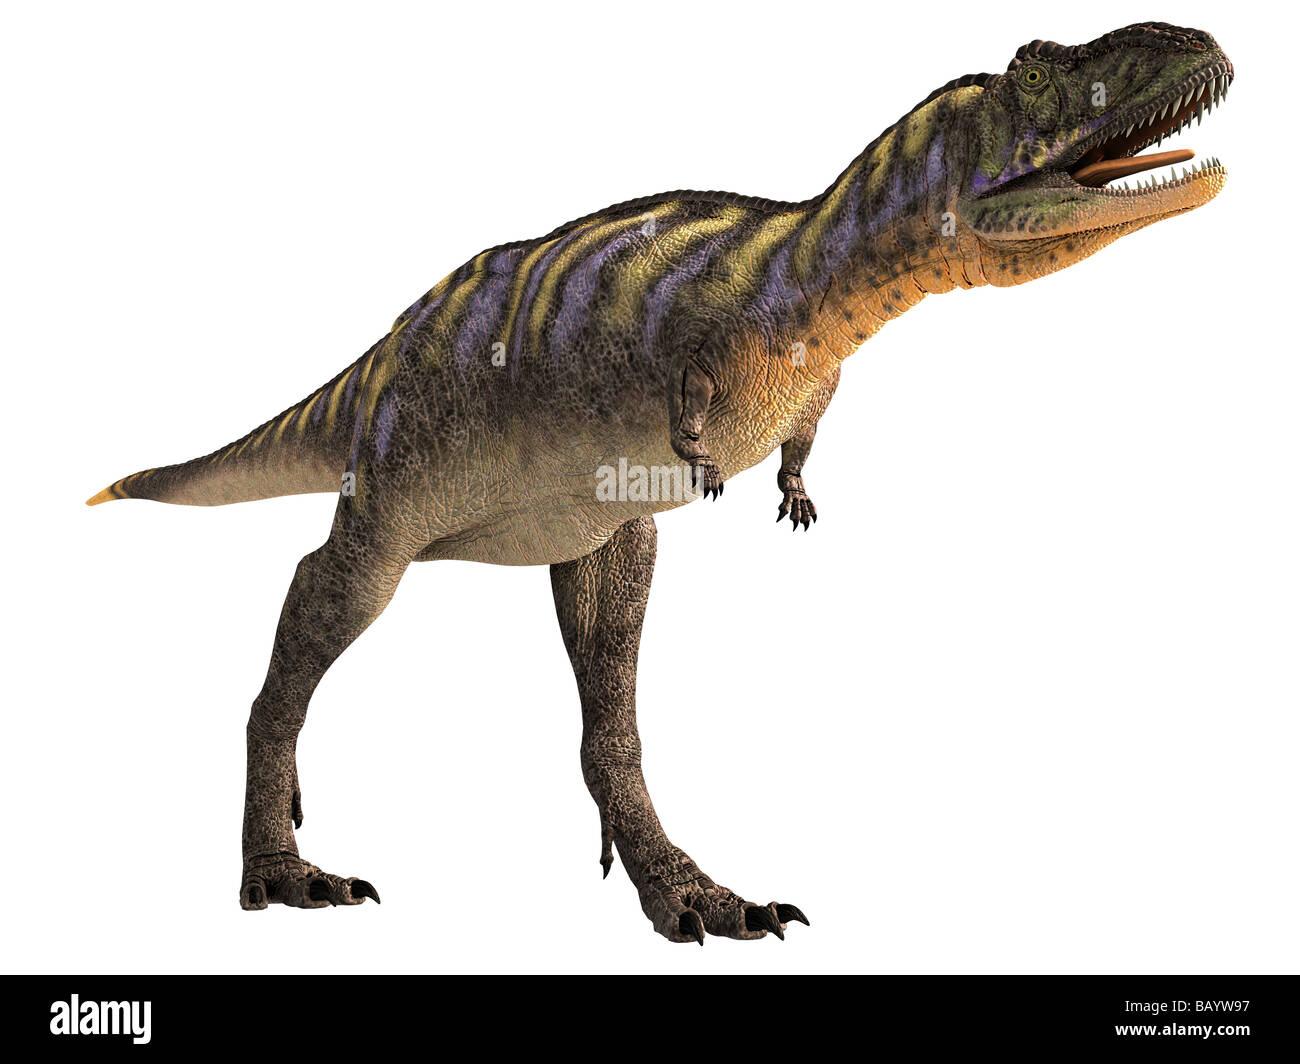 Aucasaurus garridoi is an abelisaurid from Argentina, Late Cretaceous period. - Stock Image